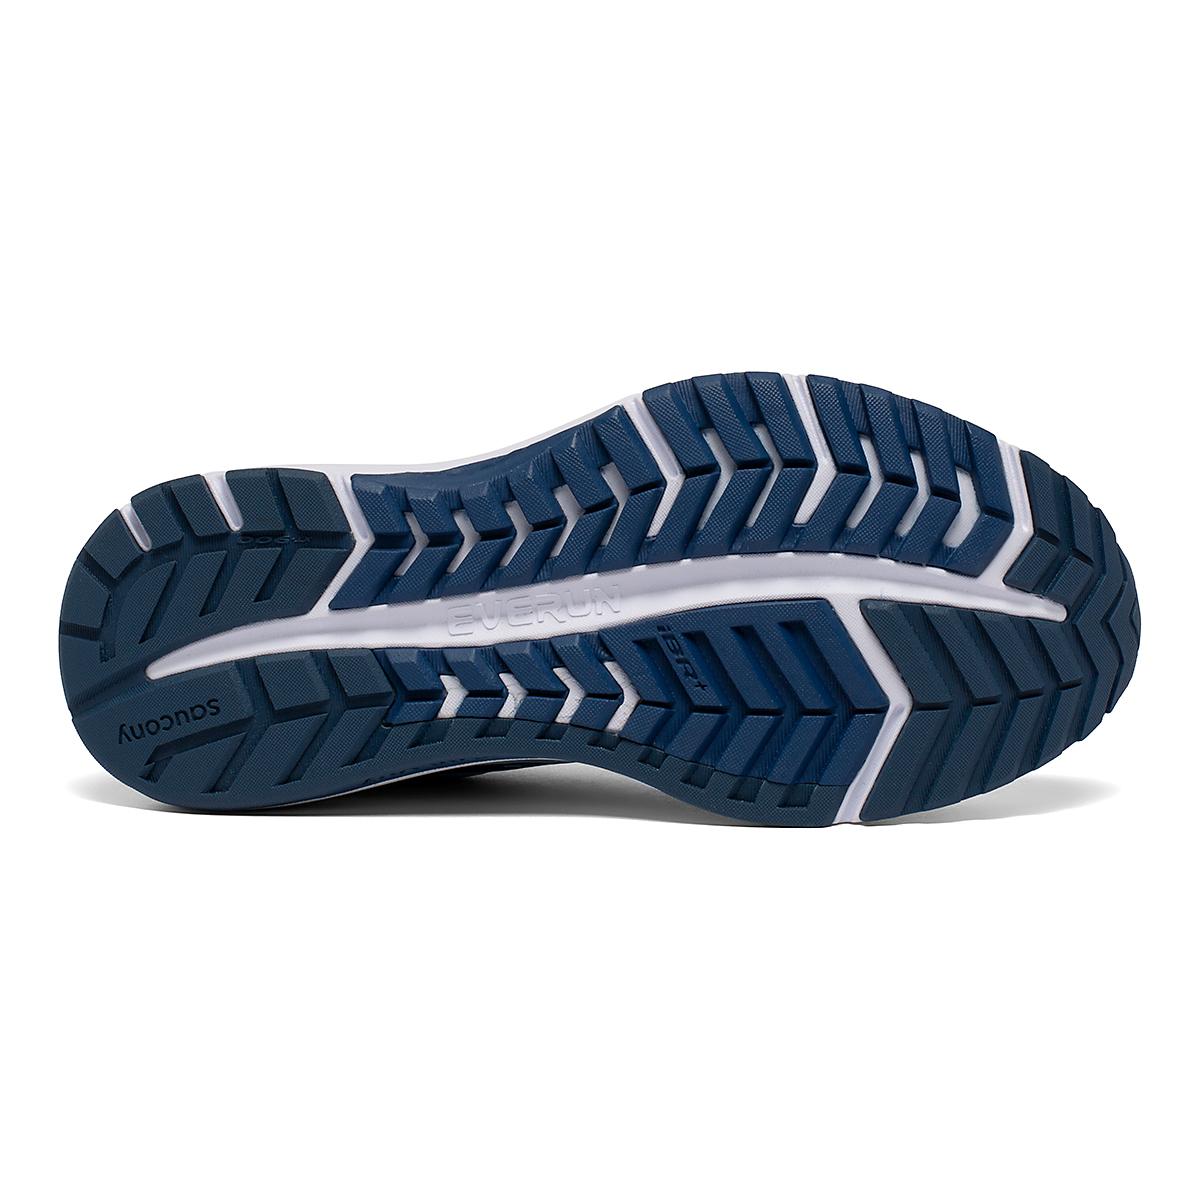 Women's Saucony Omni 19 Running Shoe - Color: Sky/Storm - Size: 5 - Width: Regular, Sky/Storm, large, image 5